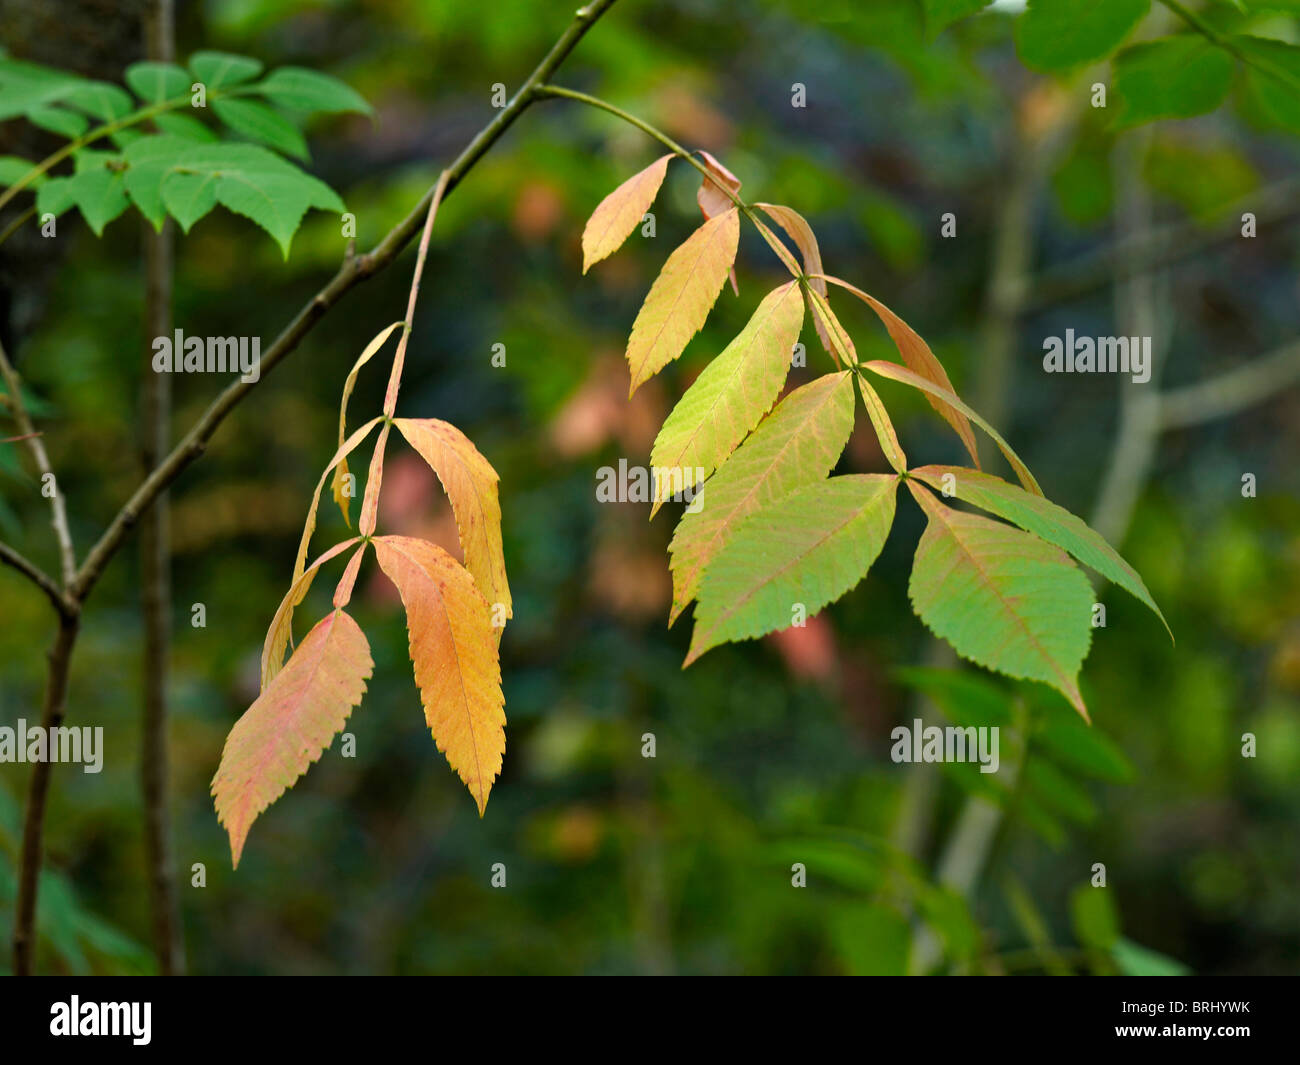 Autumn leaves of the Rhus chinensis at the Arboretum de la Martiniere - Stock Image